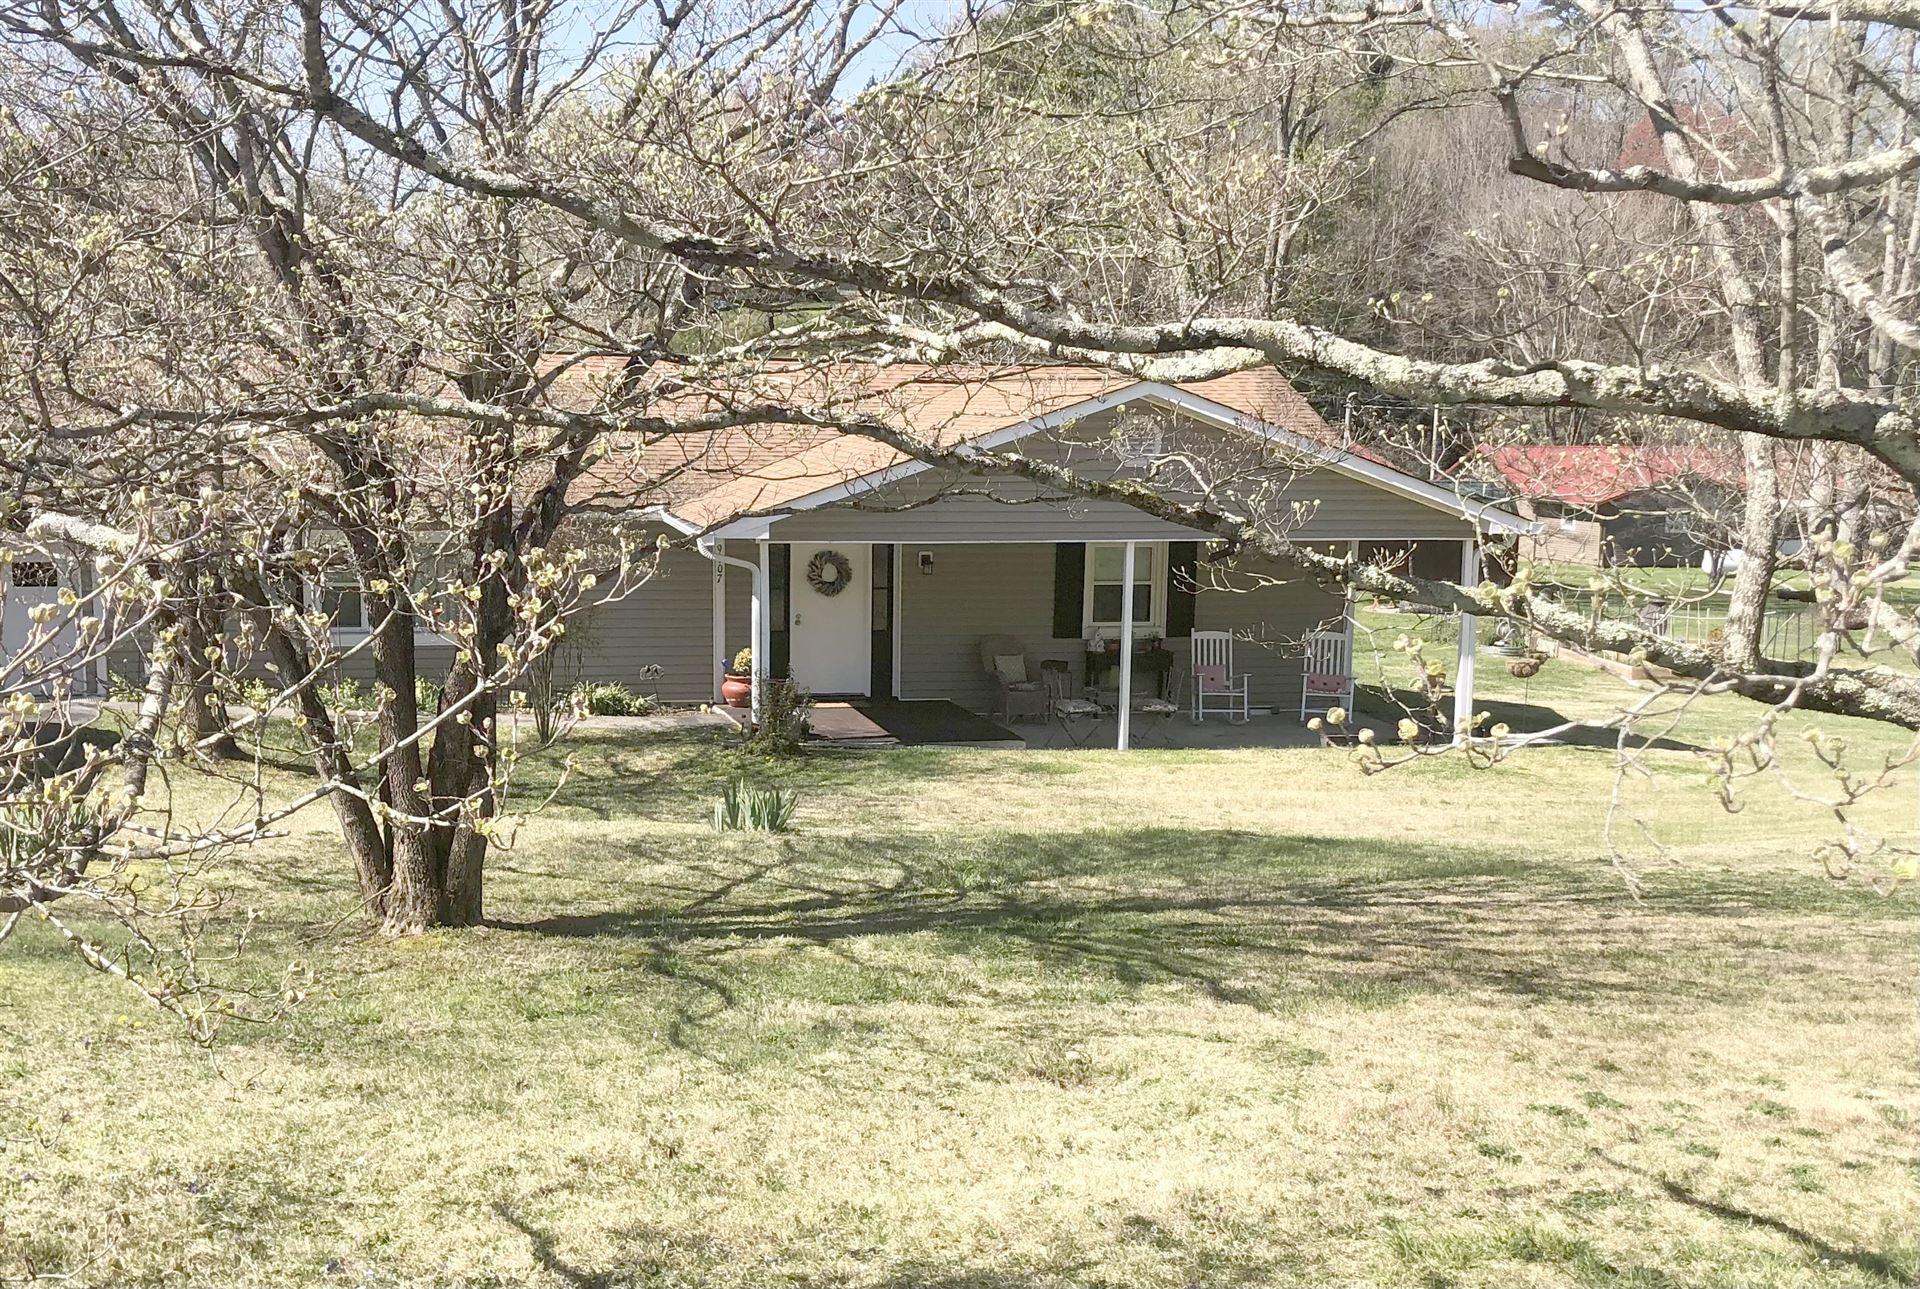 Photo of 9107 Joy Lane, Oak Ridge, TN 37830 (MLS # 1147469)